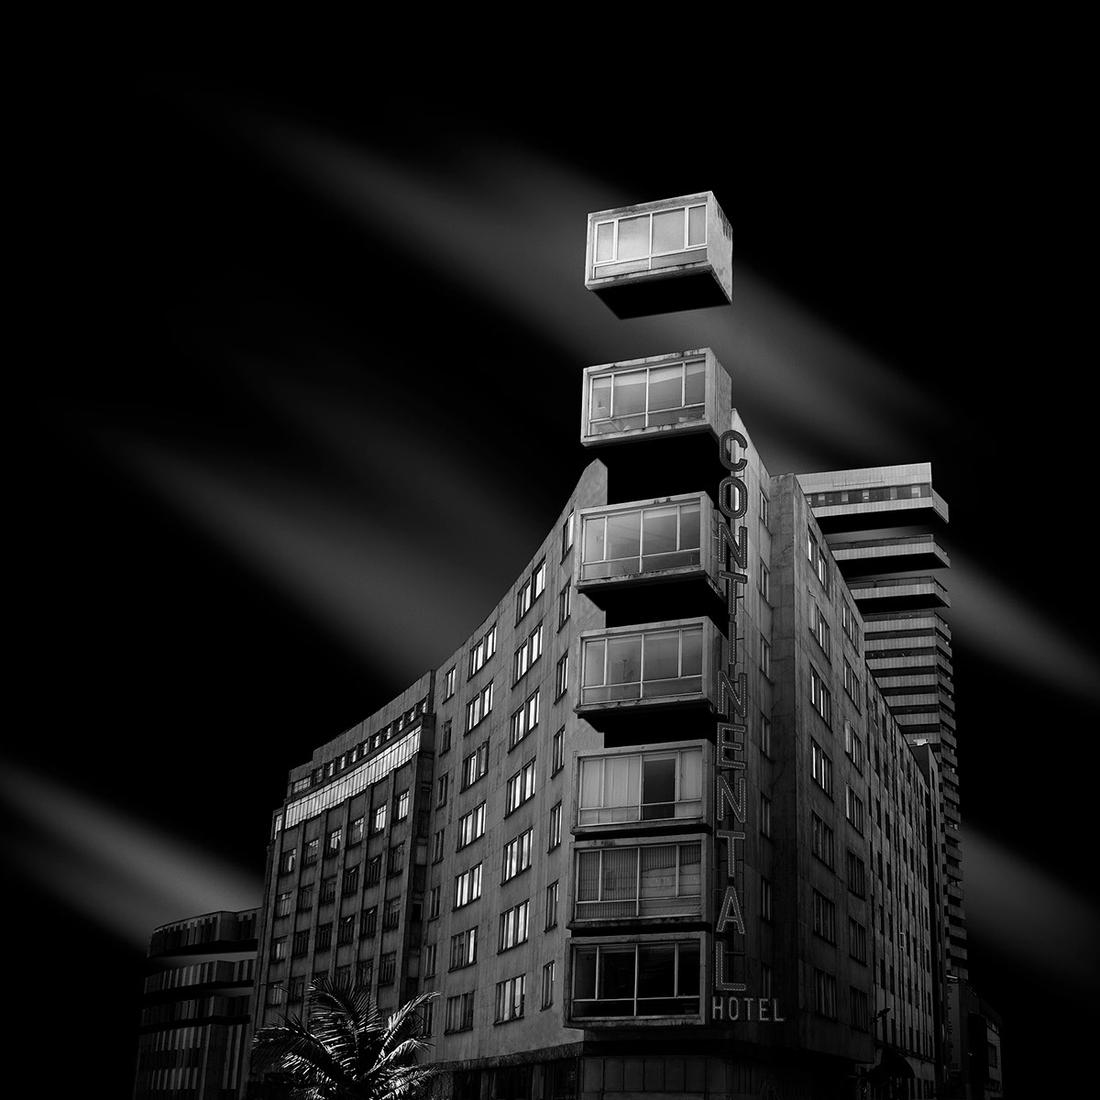 08-Daniel-Garay-Arango-Black-and-White-Surreal-Photographs-Architectural-Deconstruction-www-designstack-co